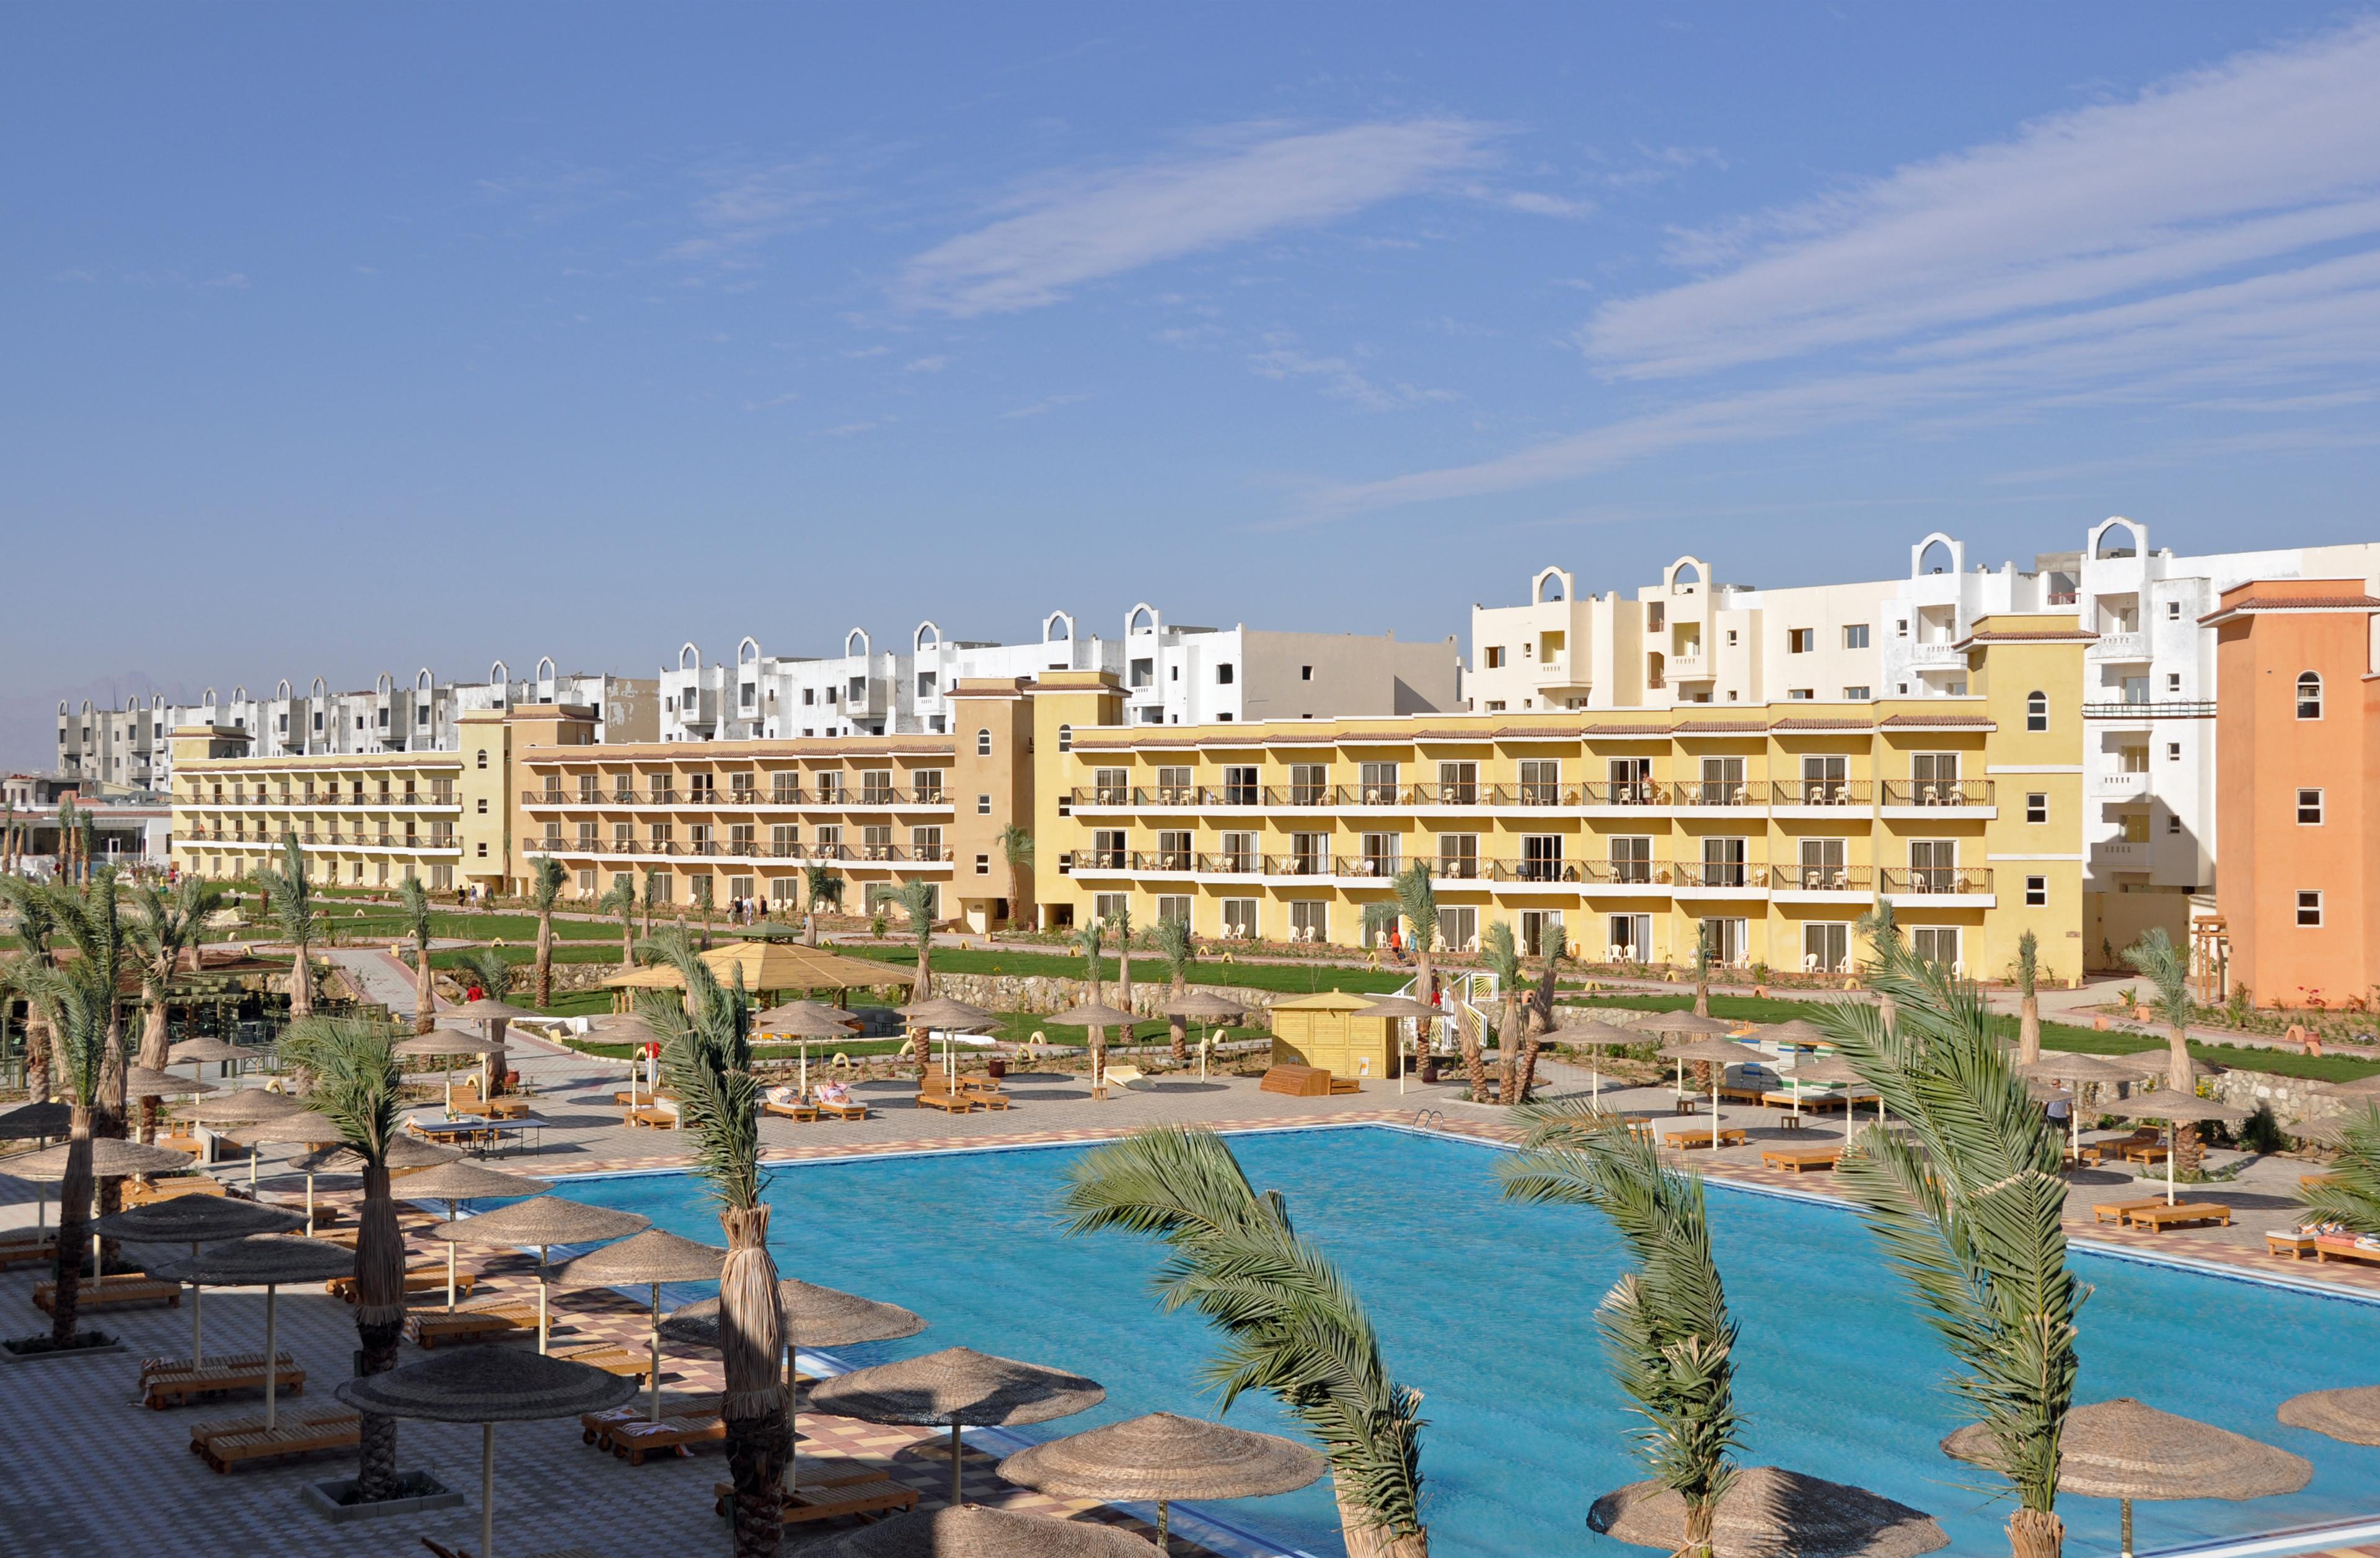 Hurghada Hotel Sunny Days Palma De Mirette